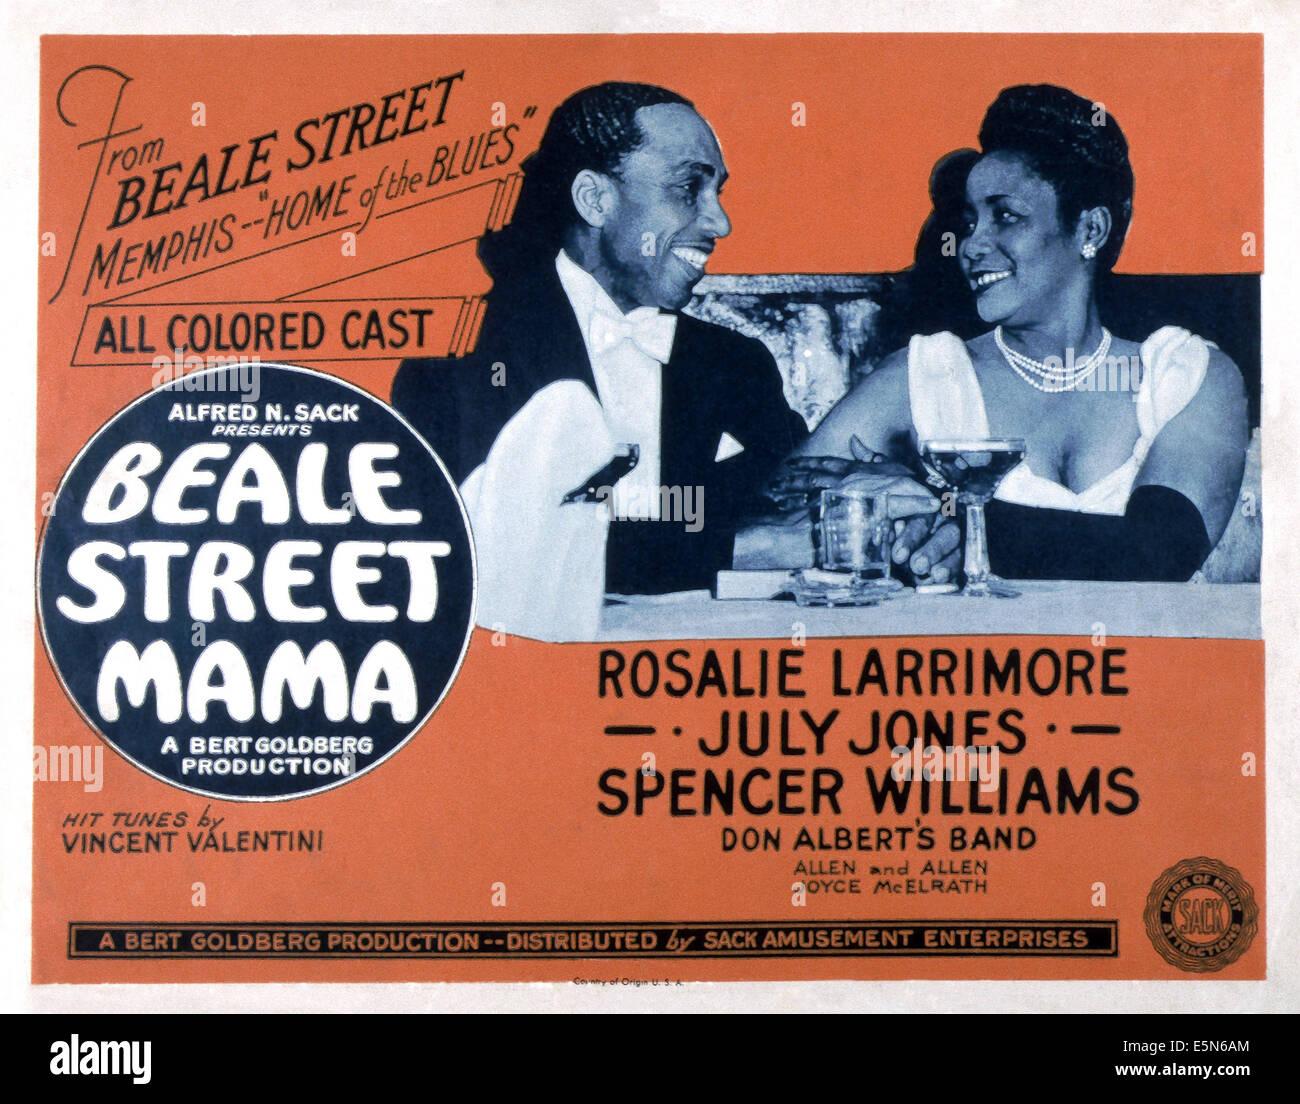 BEALE STREET MAMA, 1947 - Stock Image